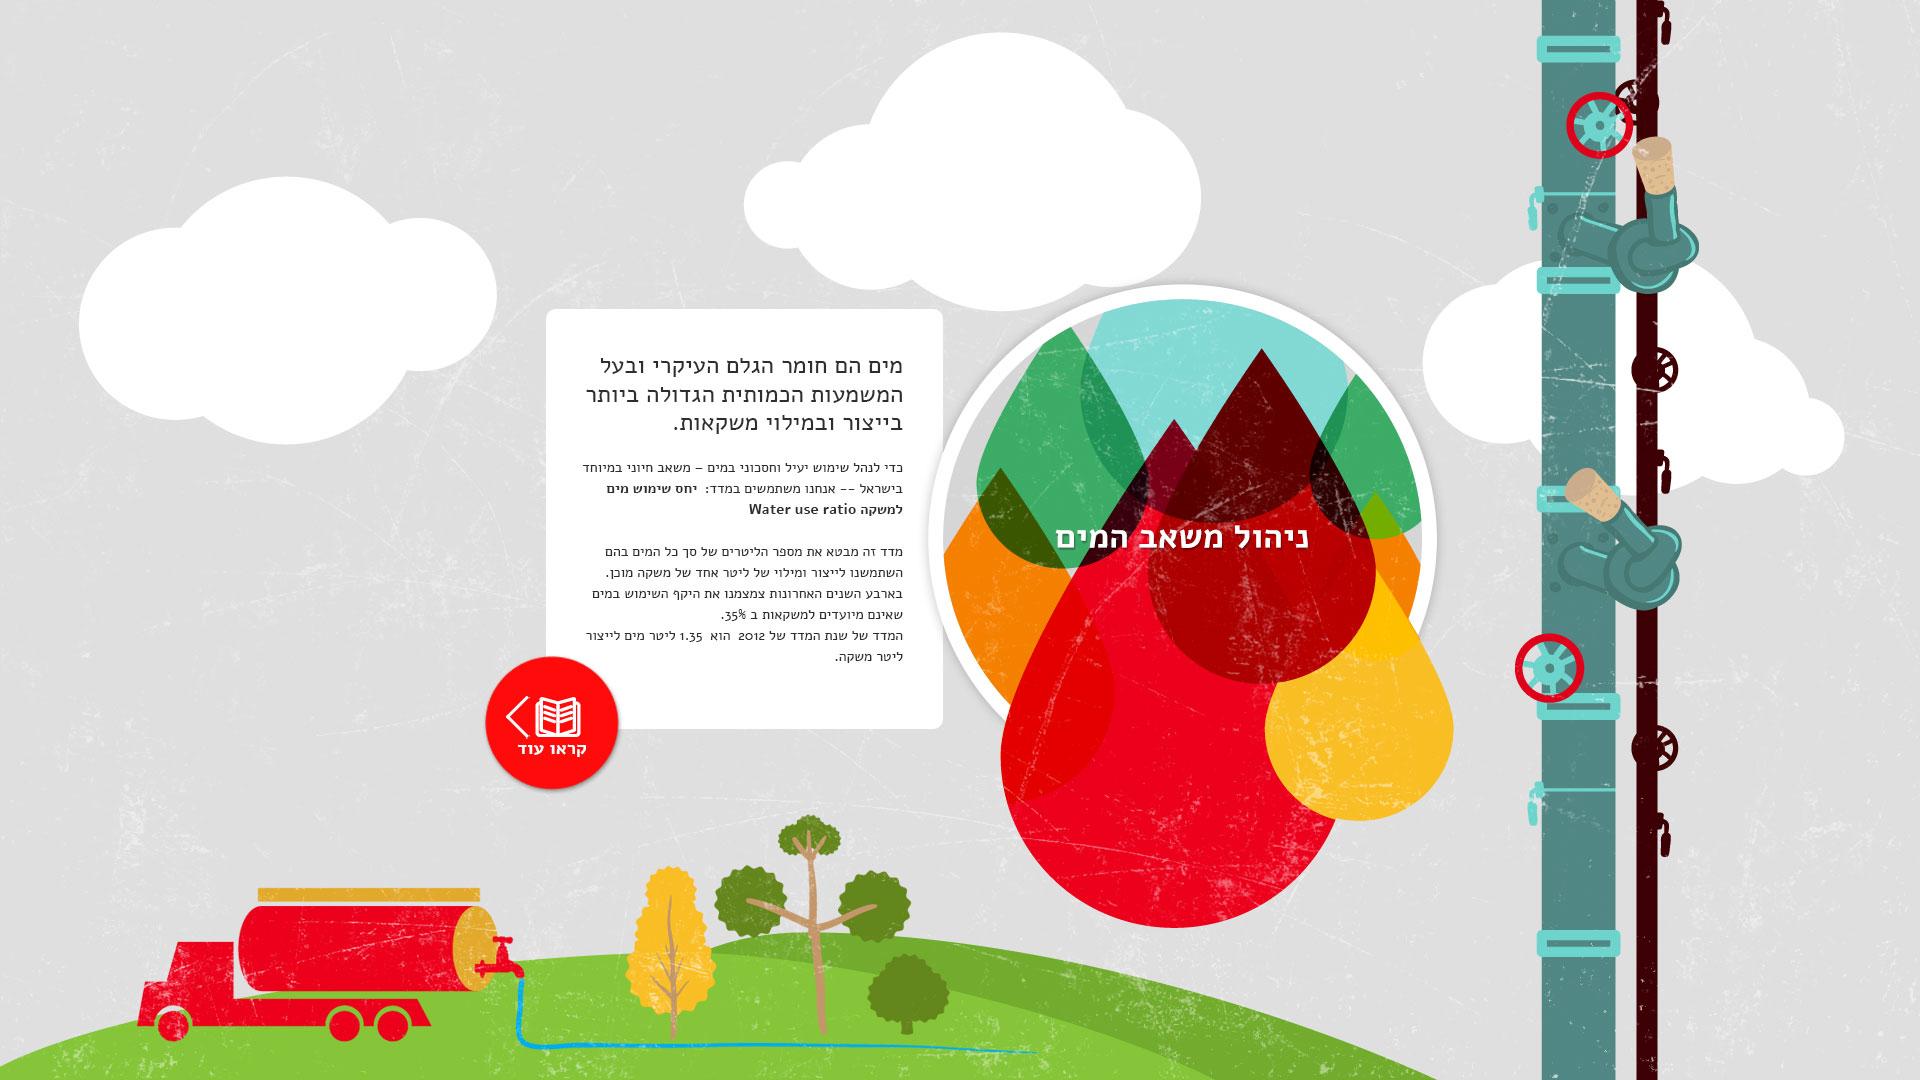 Coca Cola social responsibility website design קוקה קולה עיצוב אתר אחריות חברתית 3